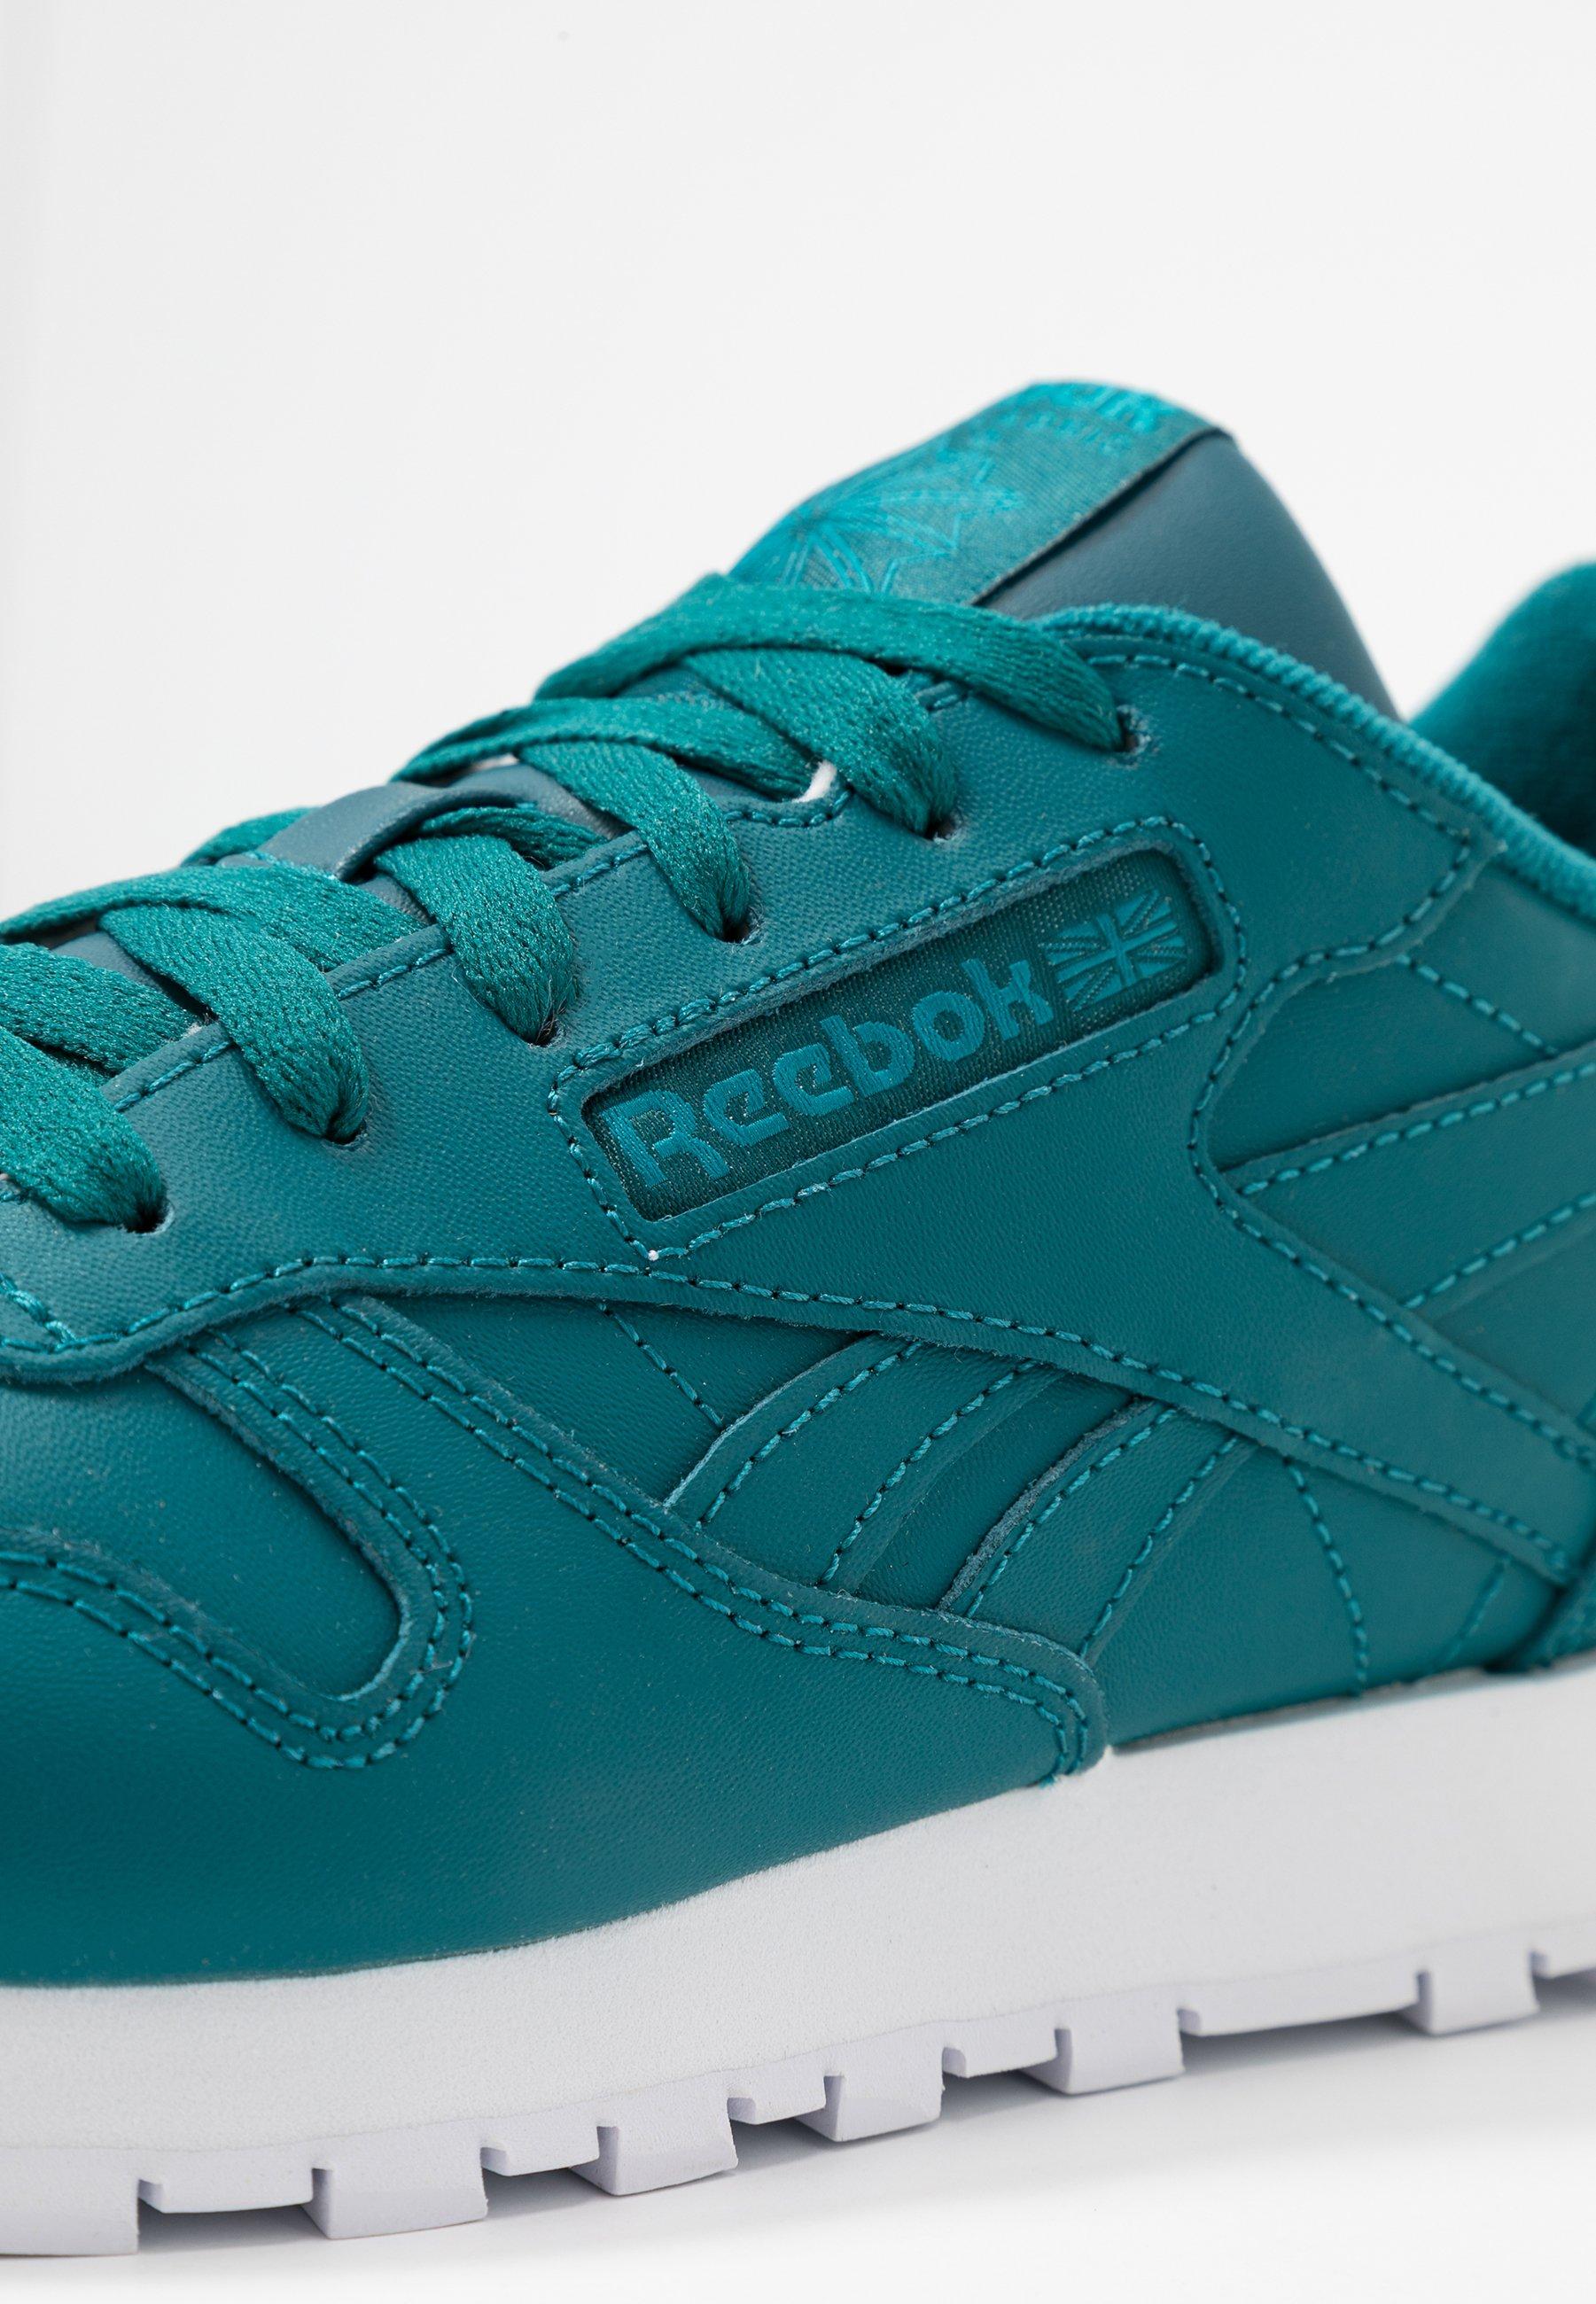 Sneakers herteawhiteseatea